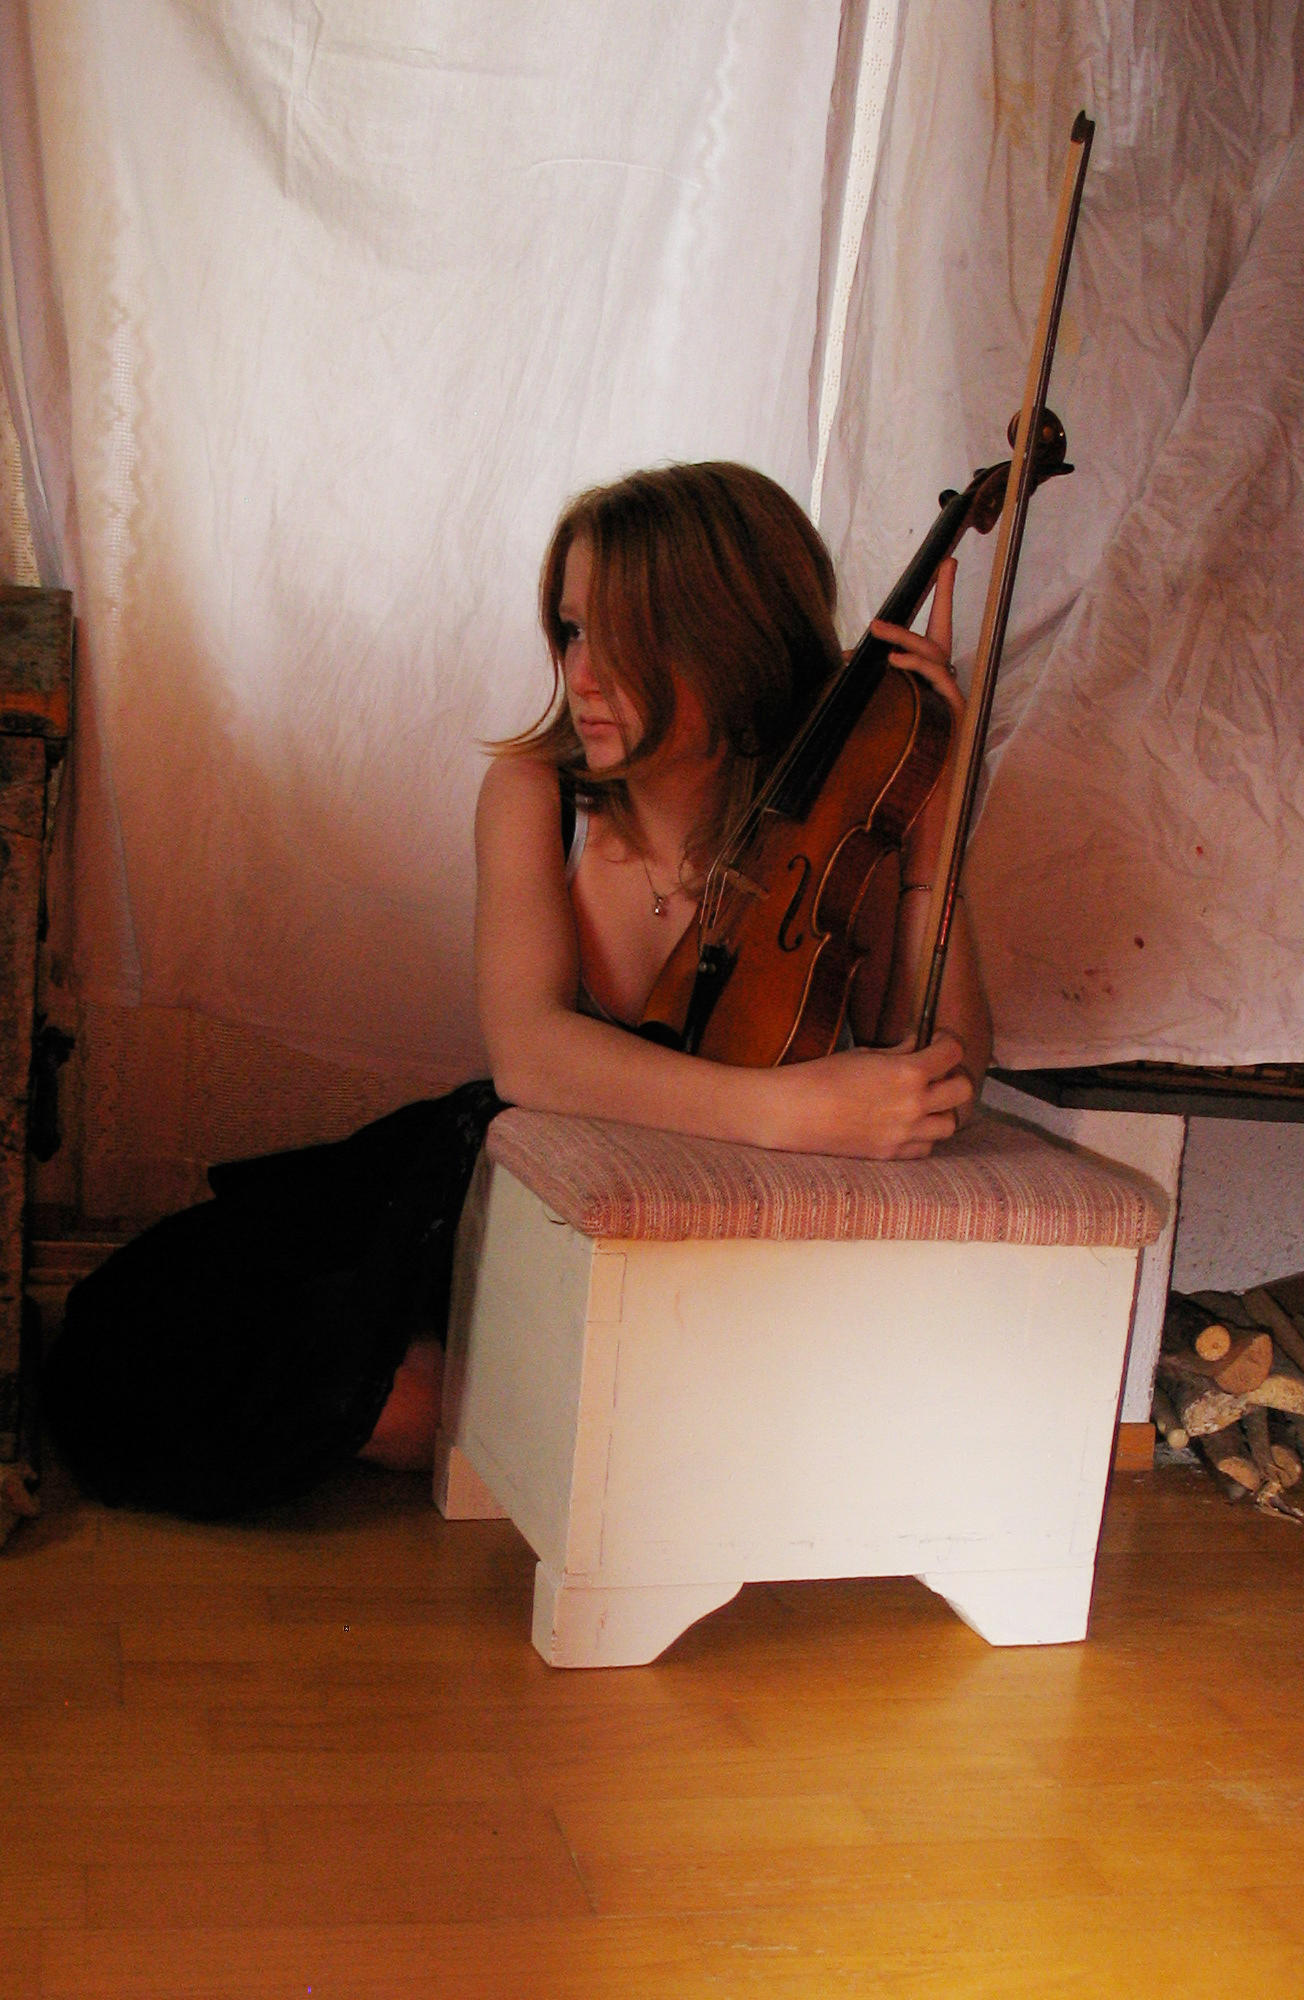 Violin Player1.7 by SeaOfFireStock